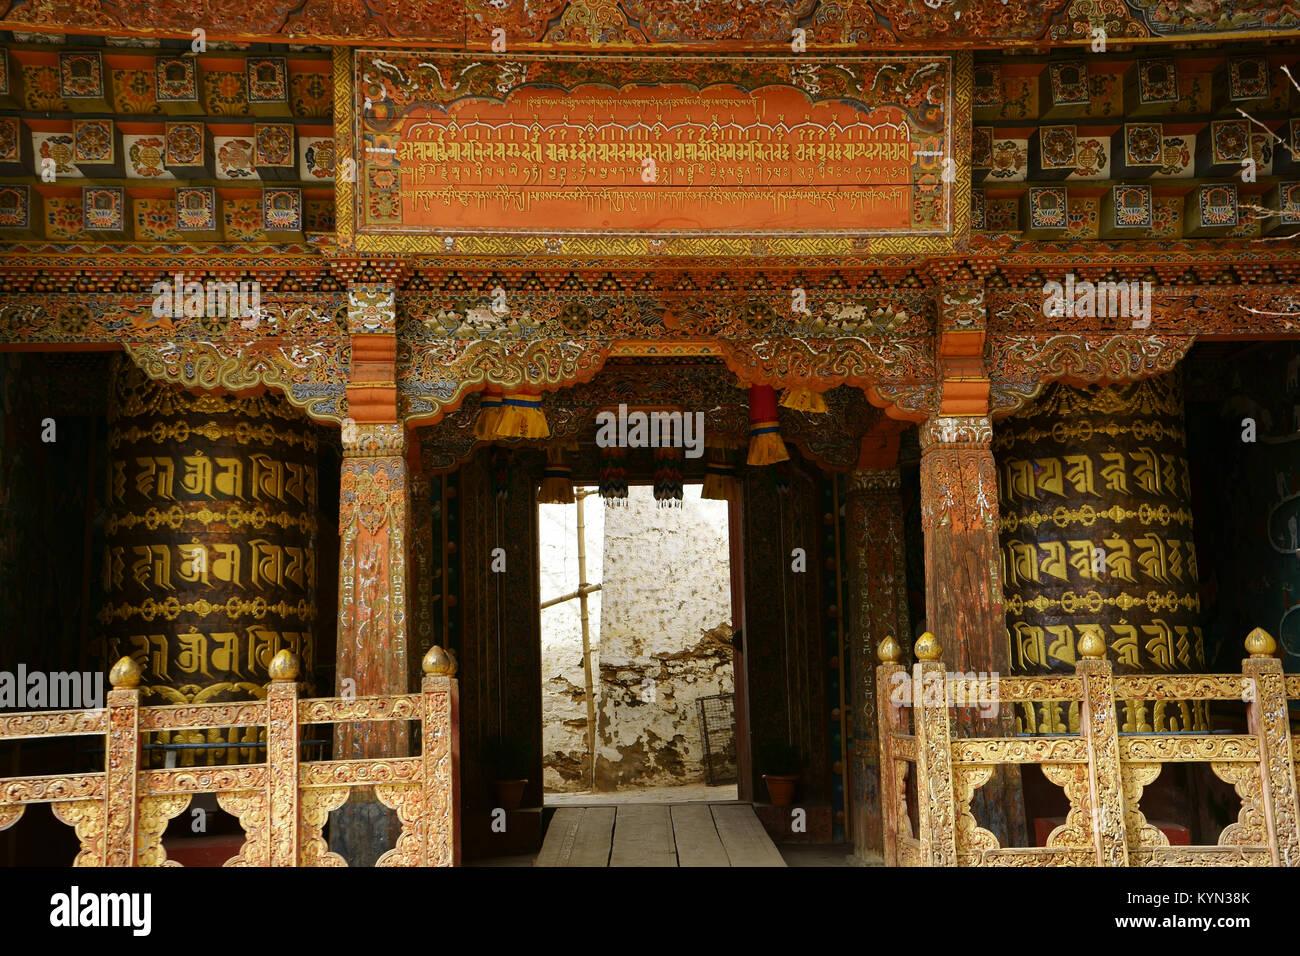 Tango Buddhist monastery and university, entrance with prayer wheels, Bhutan - Stock Image